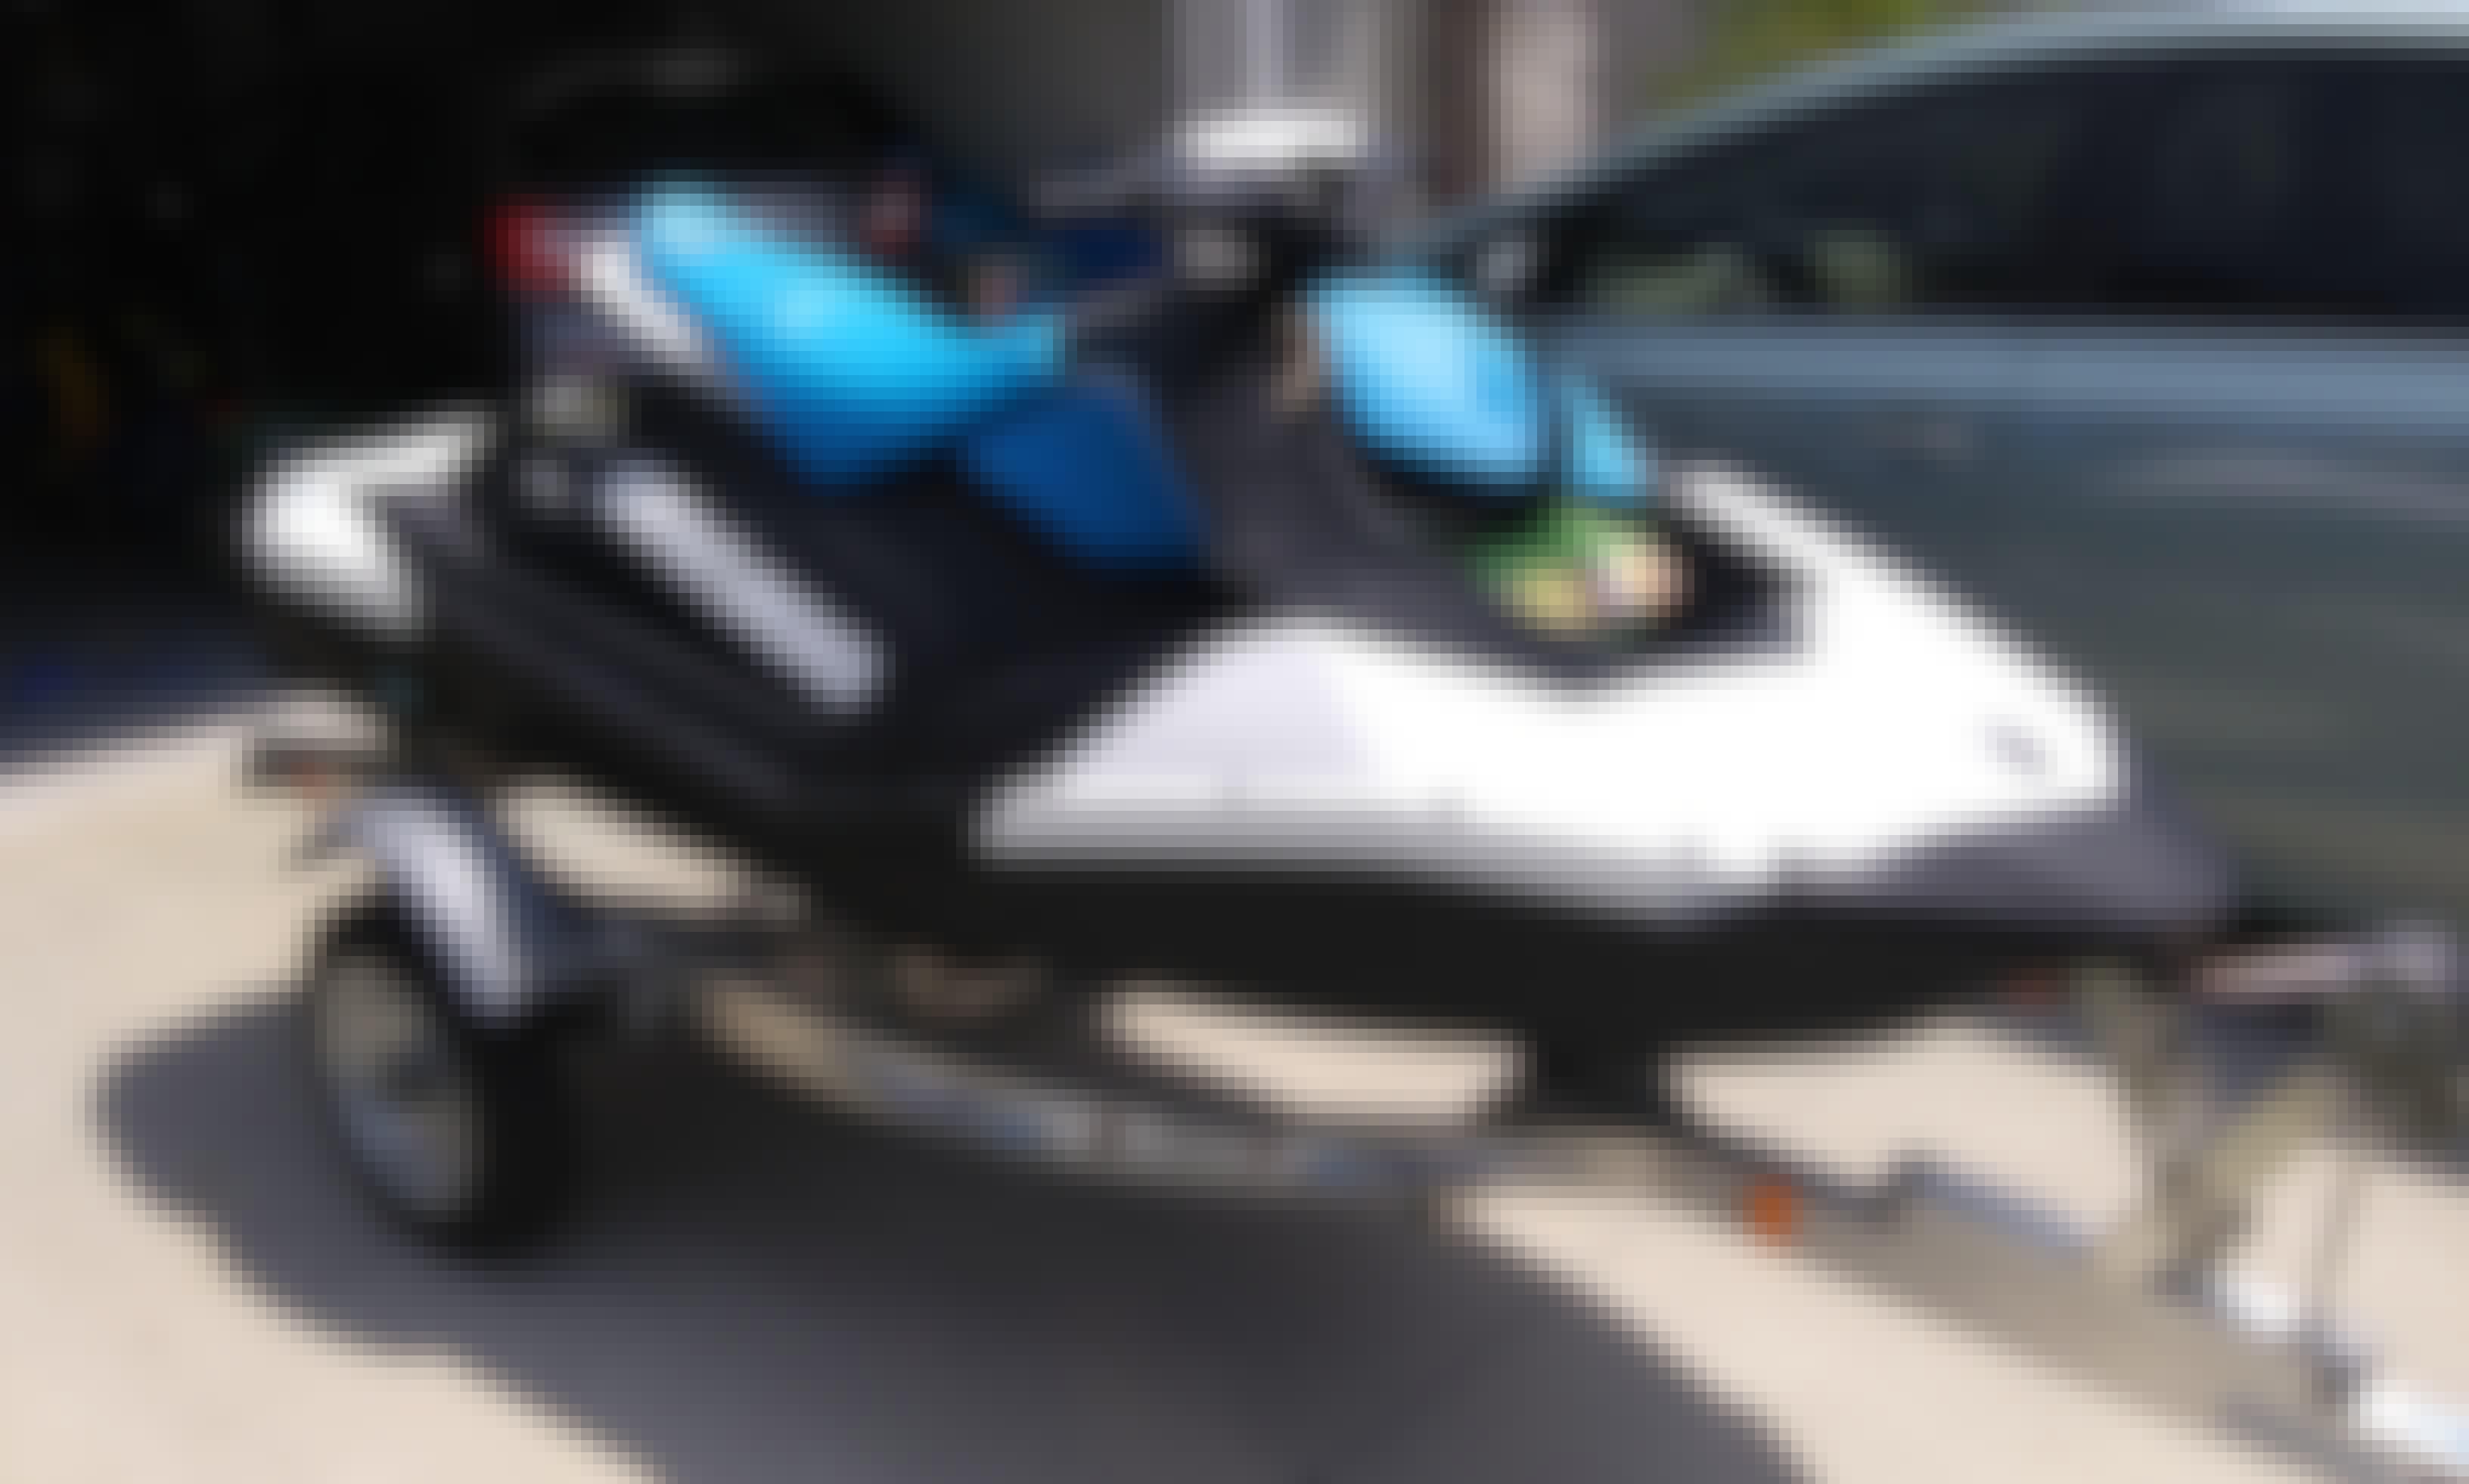 Book the 2020 Sea-Doo Spark Jetski in Kissimmee, Florida!